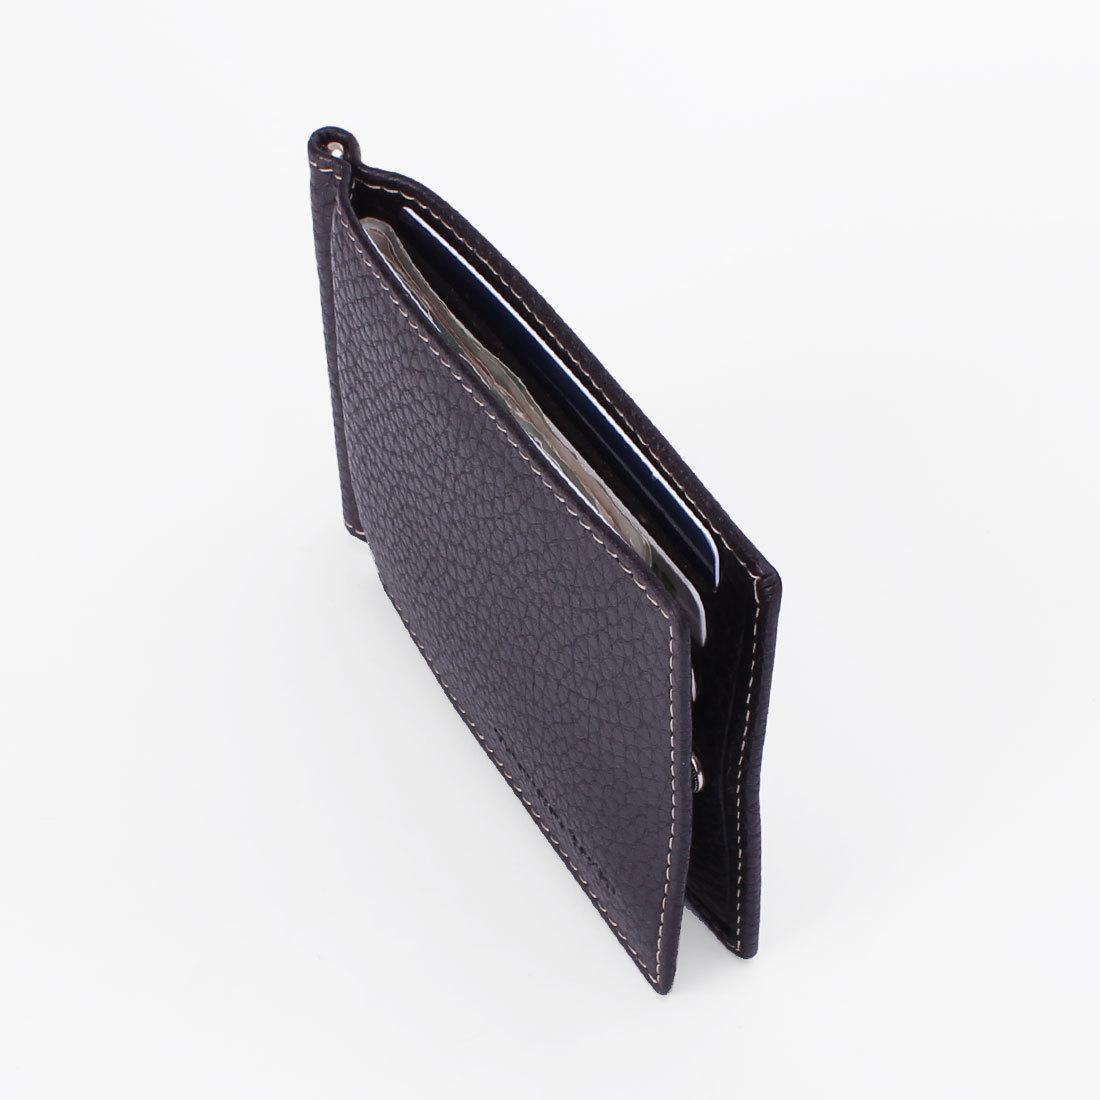 733 R - Зажим для купюр с RFID защитой без монетника